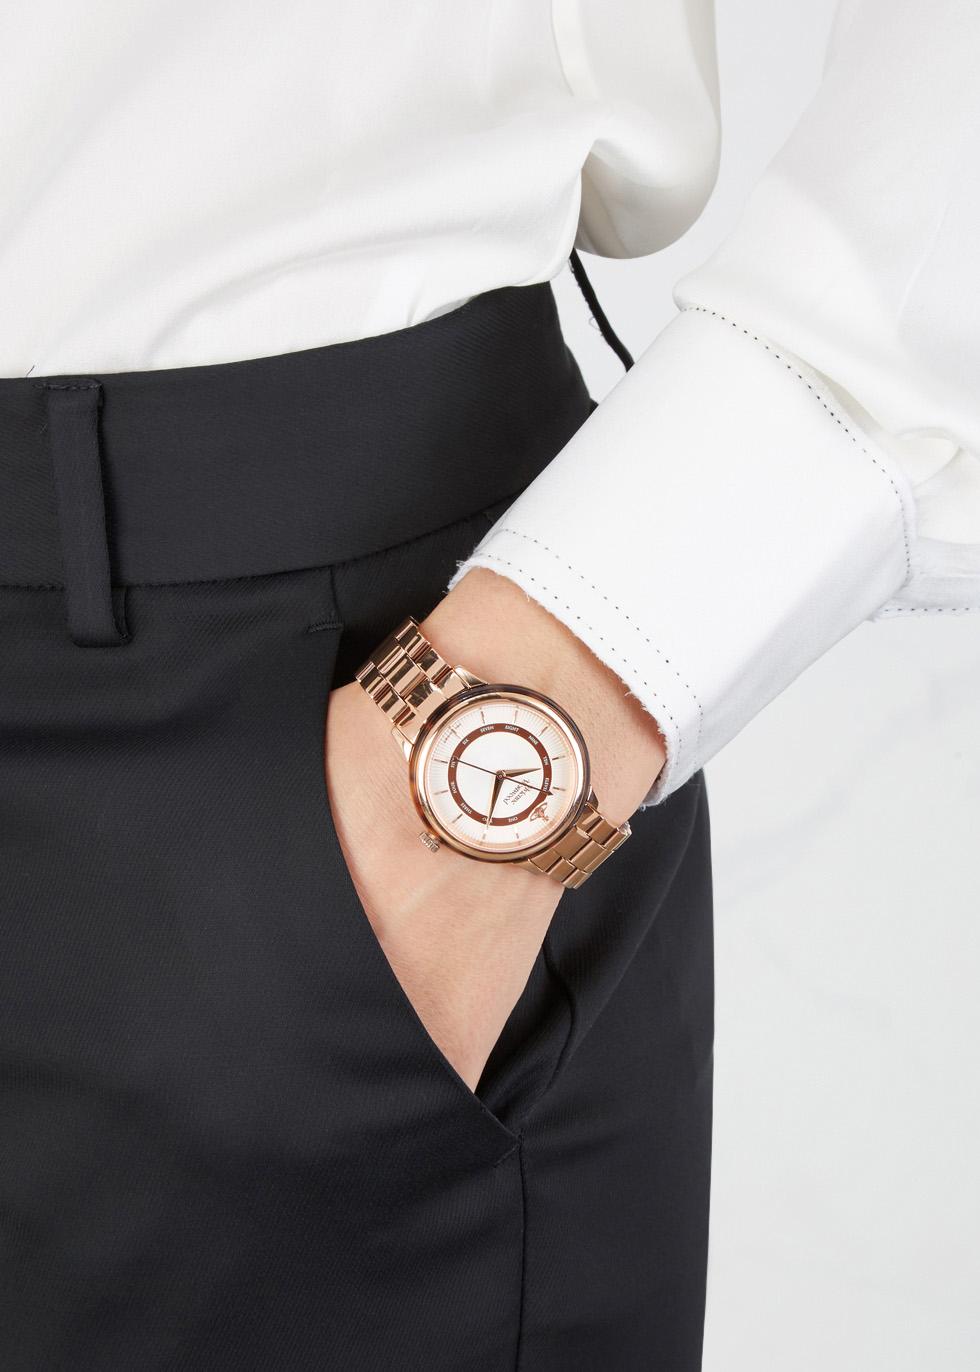 Portobello rose gold tone watch - Vivienne Westwood